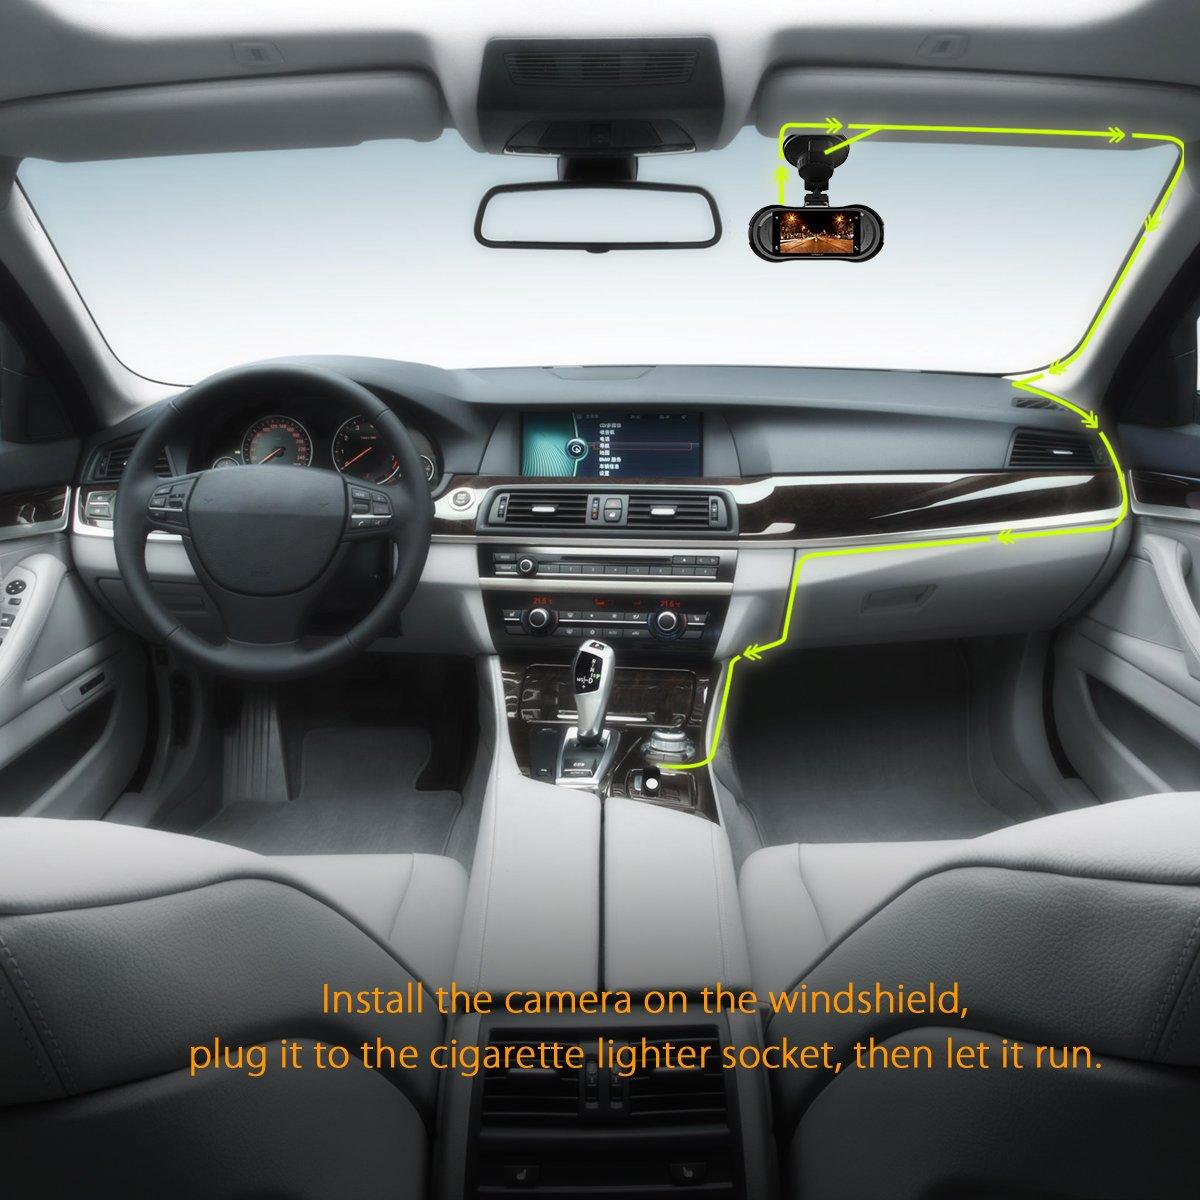 Vantrue X3 WIFI Dash Cam, Super HD 2.5K Car Dashboard Camera 1440P Car Camera with Ambarella A12 Chipset, 170°Wide Angle, Super HDR Night Vision, Loop Recording, Parking Mode, Motion Detection by VANTRUE (Image #7)